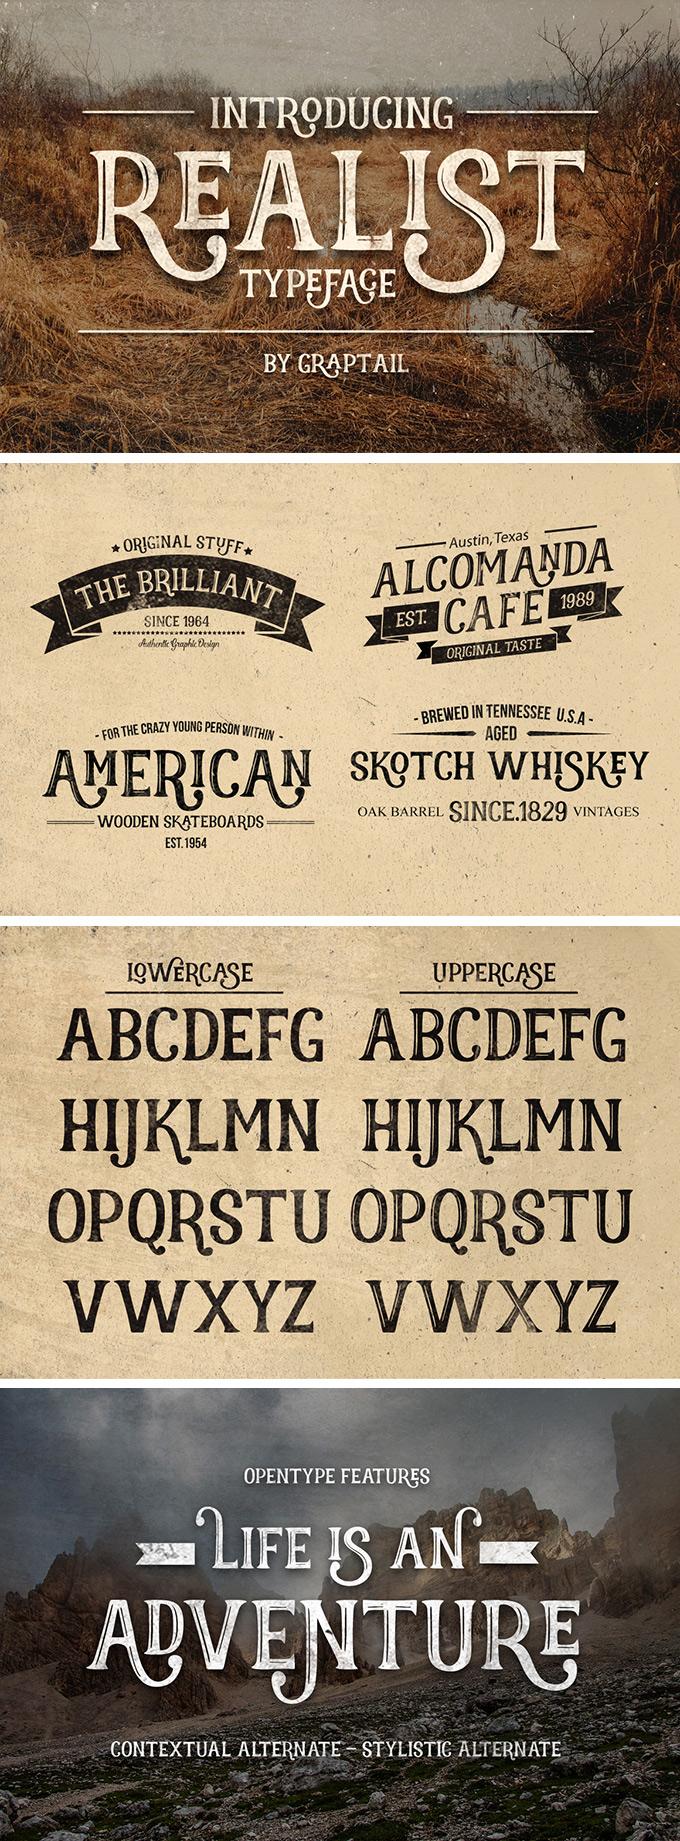 Realist Font - Dafont Free